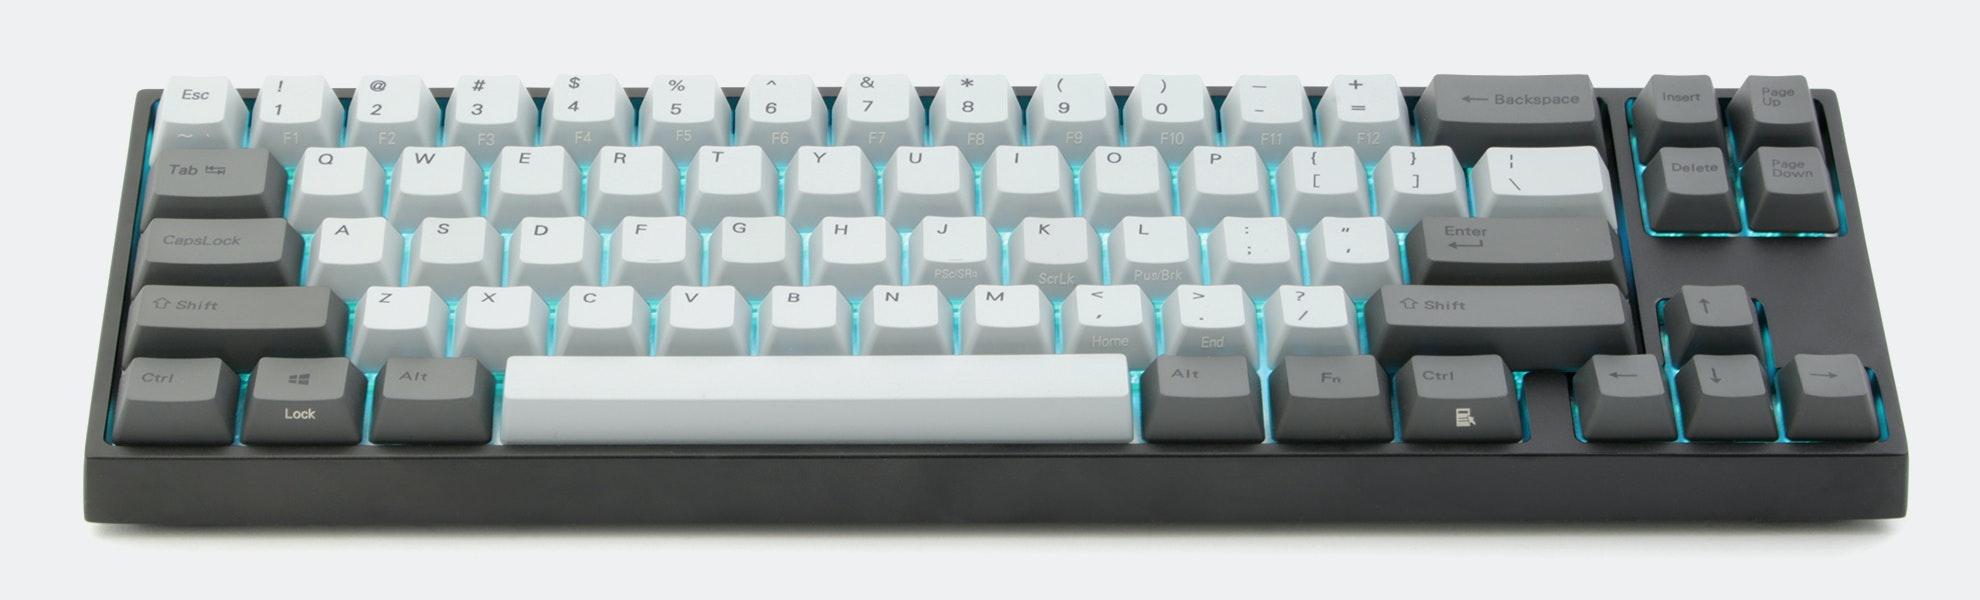 Varmilo VA68M RGB Mechanical Keyboard